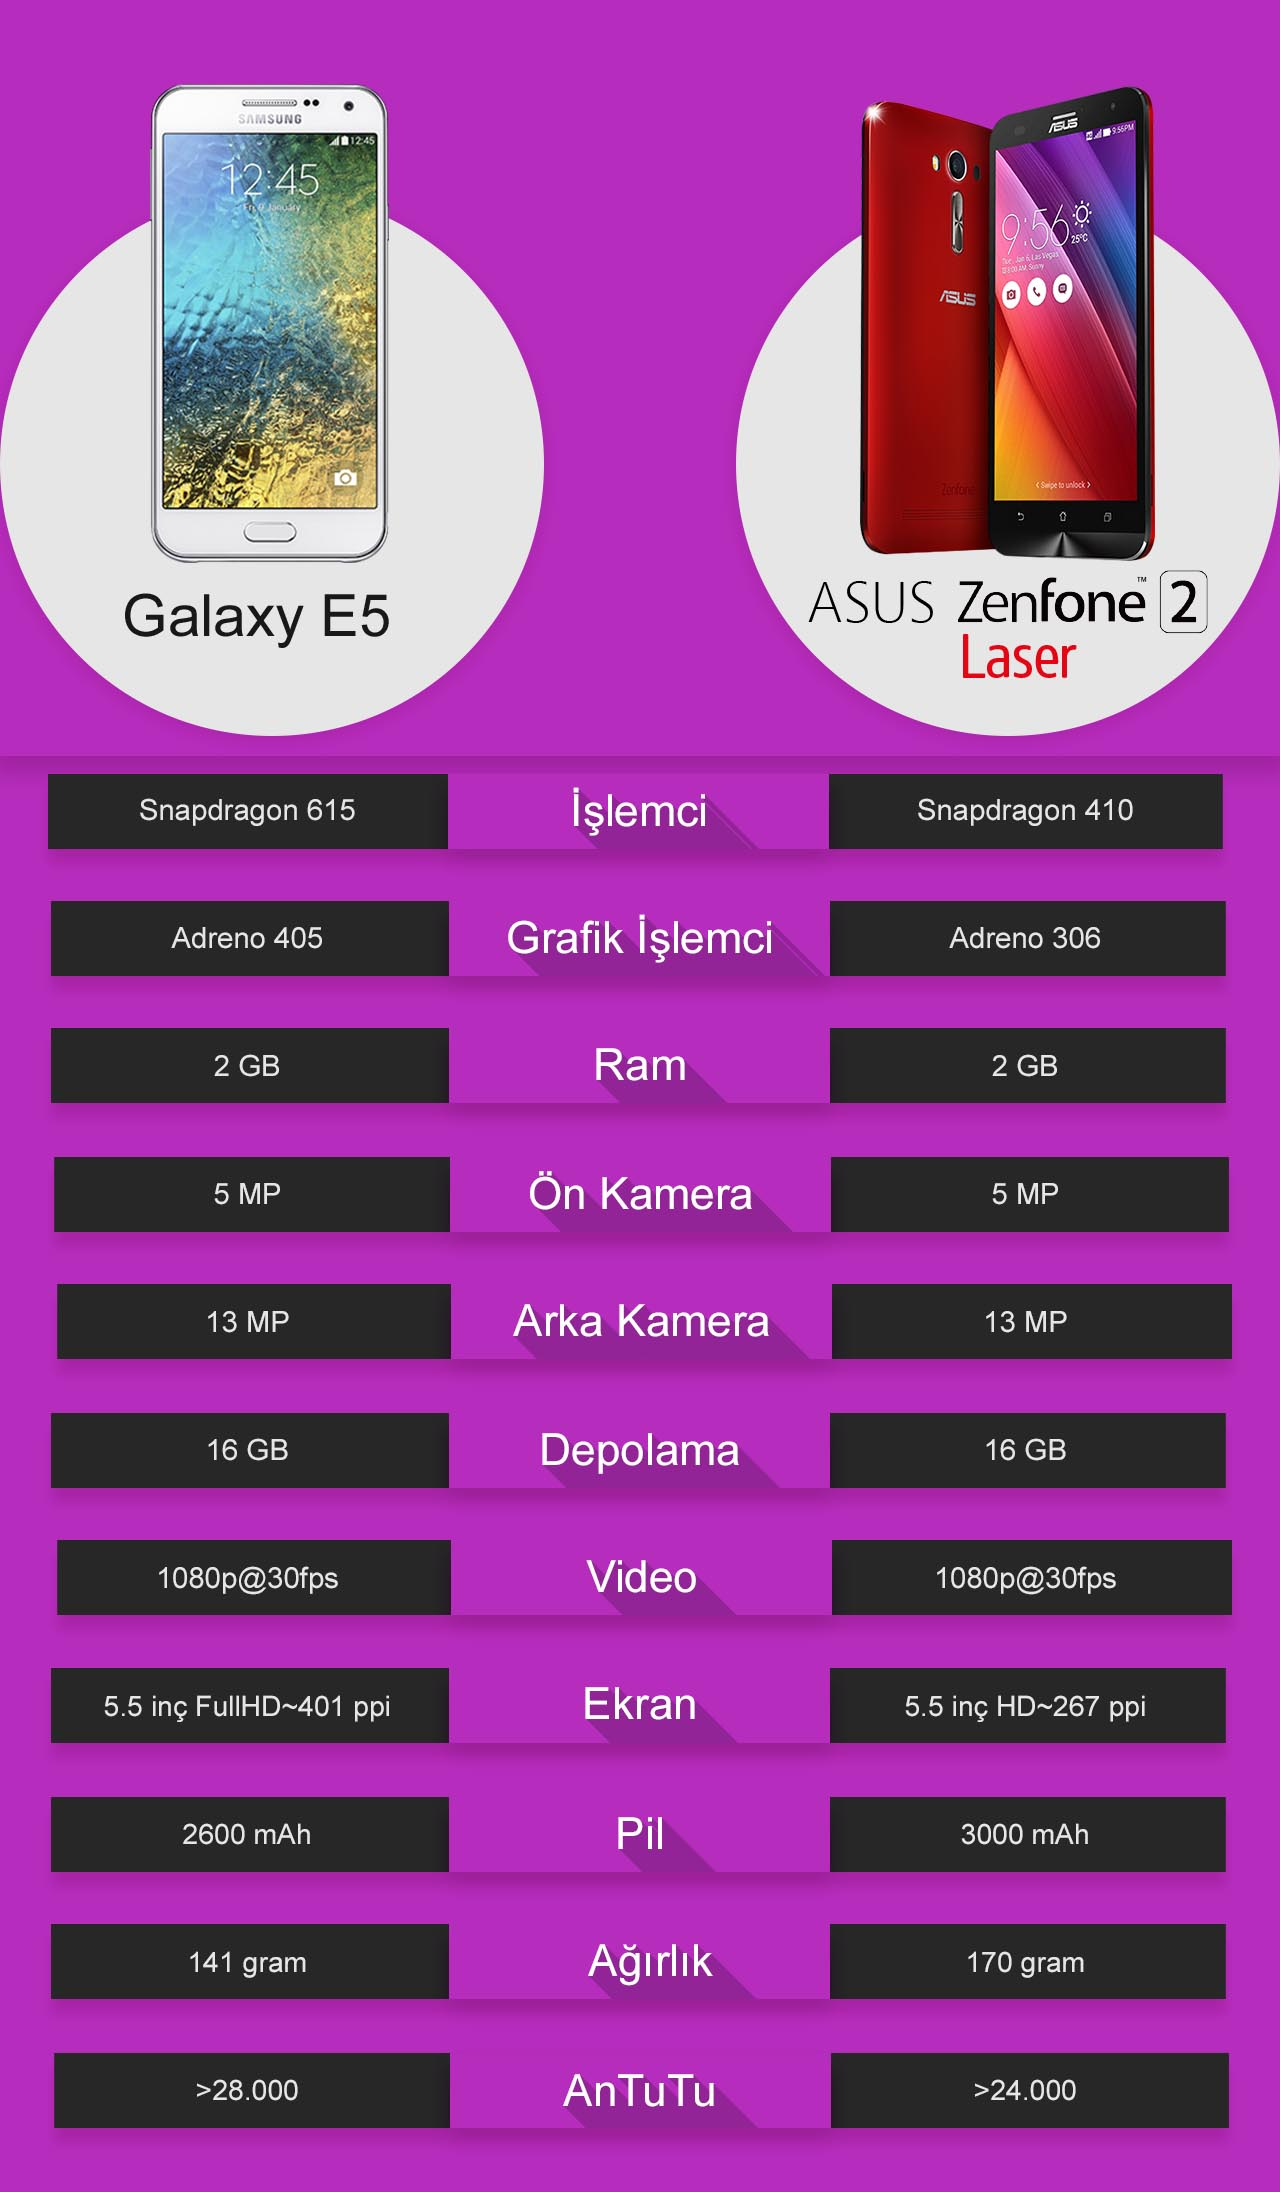 asus_zenfone_2_laser_vs_samsung_galaxy_a7_karşılaştırma